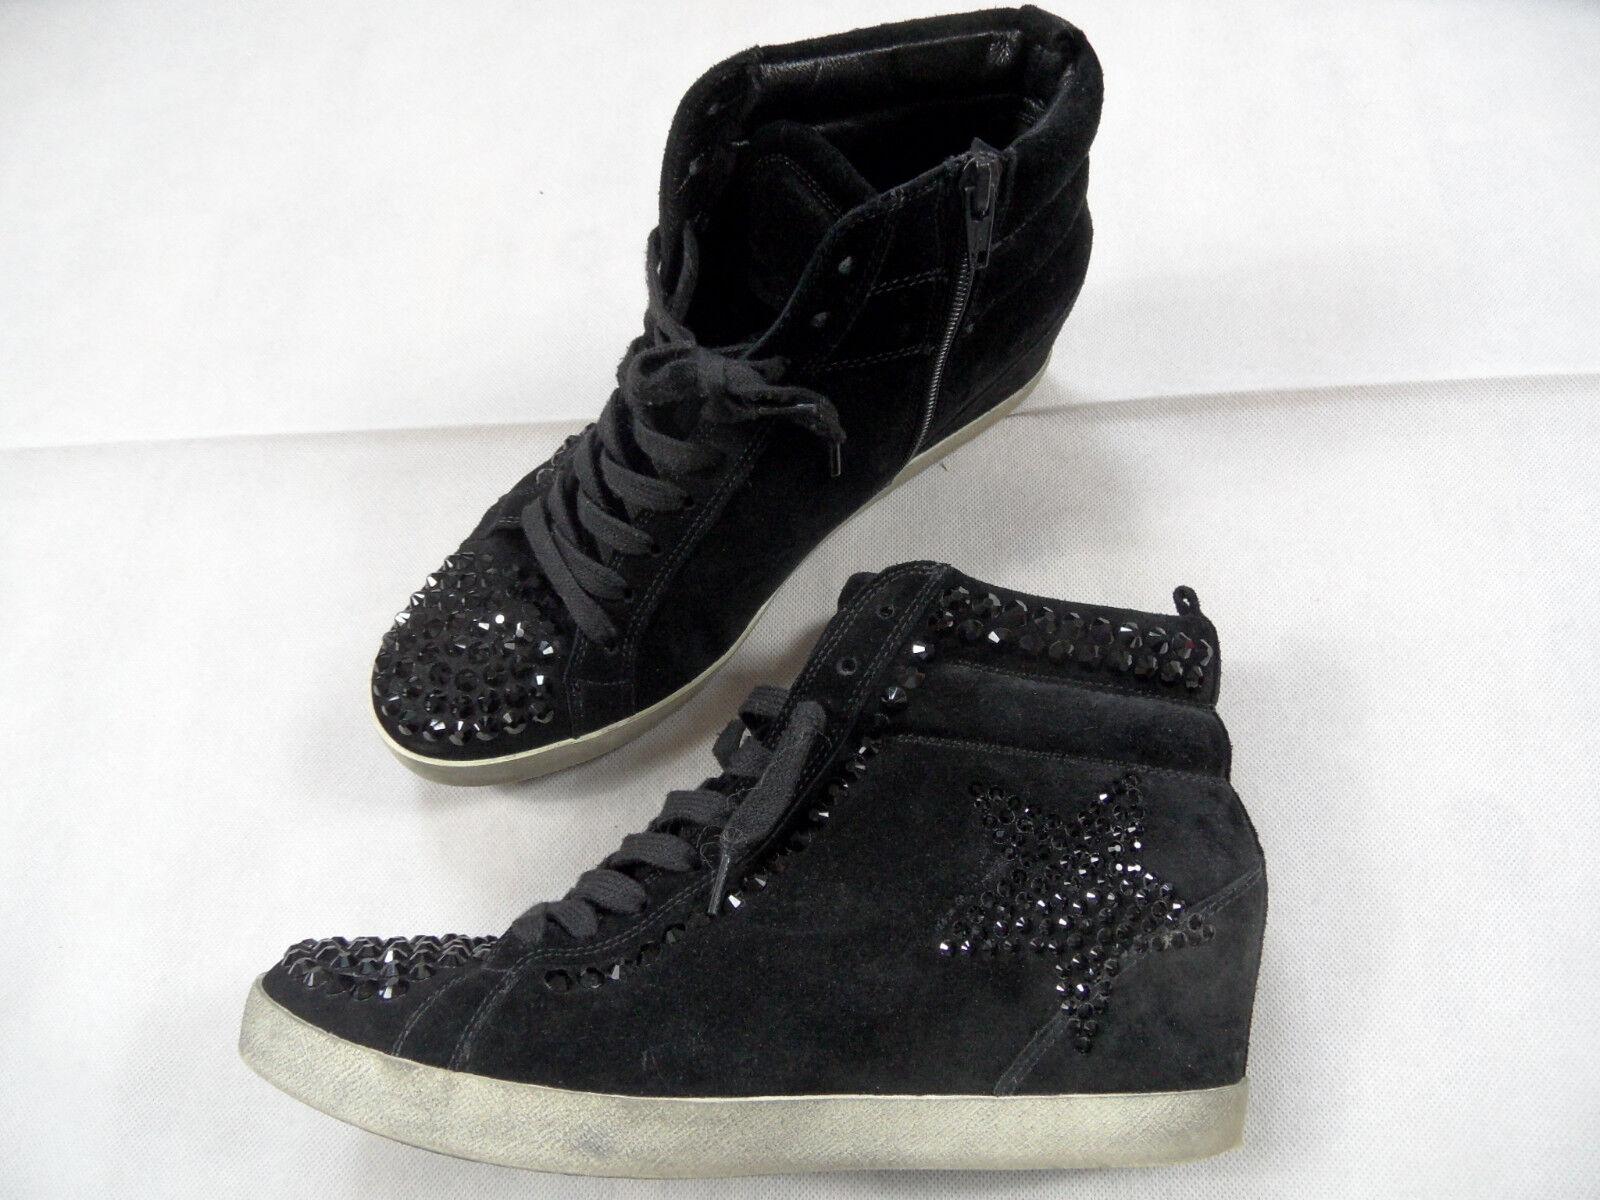 KENNEL&SCHMENGER Swarovski Keilabsatz Sneakers schwarz Swarovski KENNEL&SCHMENGER schwarz Gr.40,5 TOP SJ718 c82905